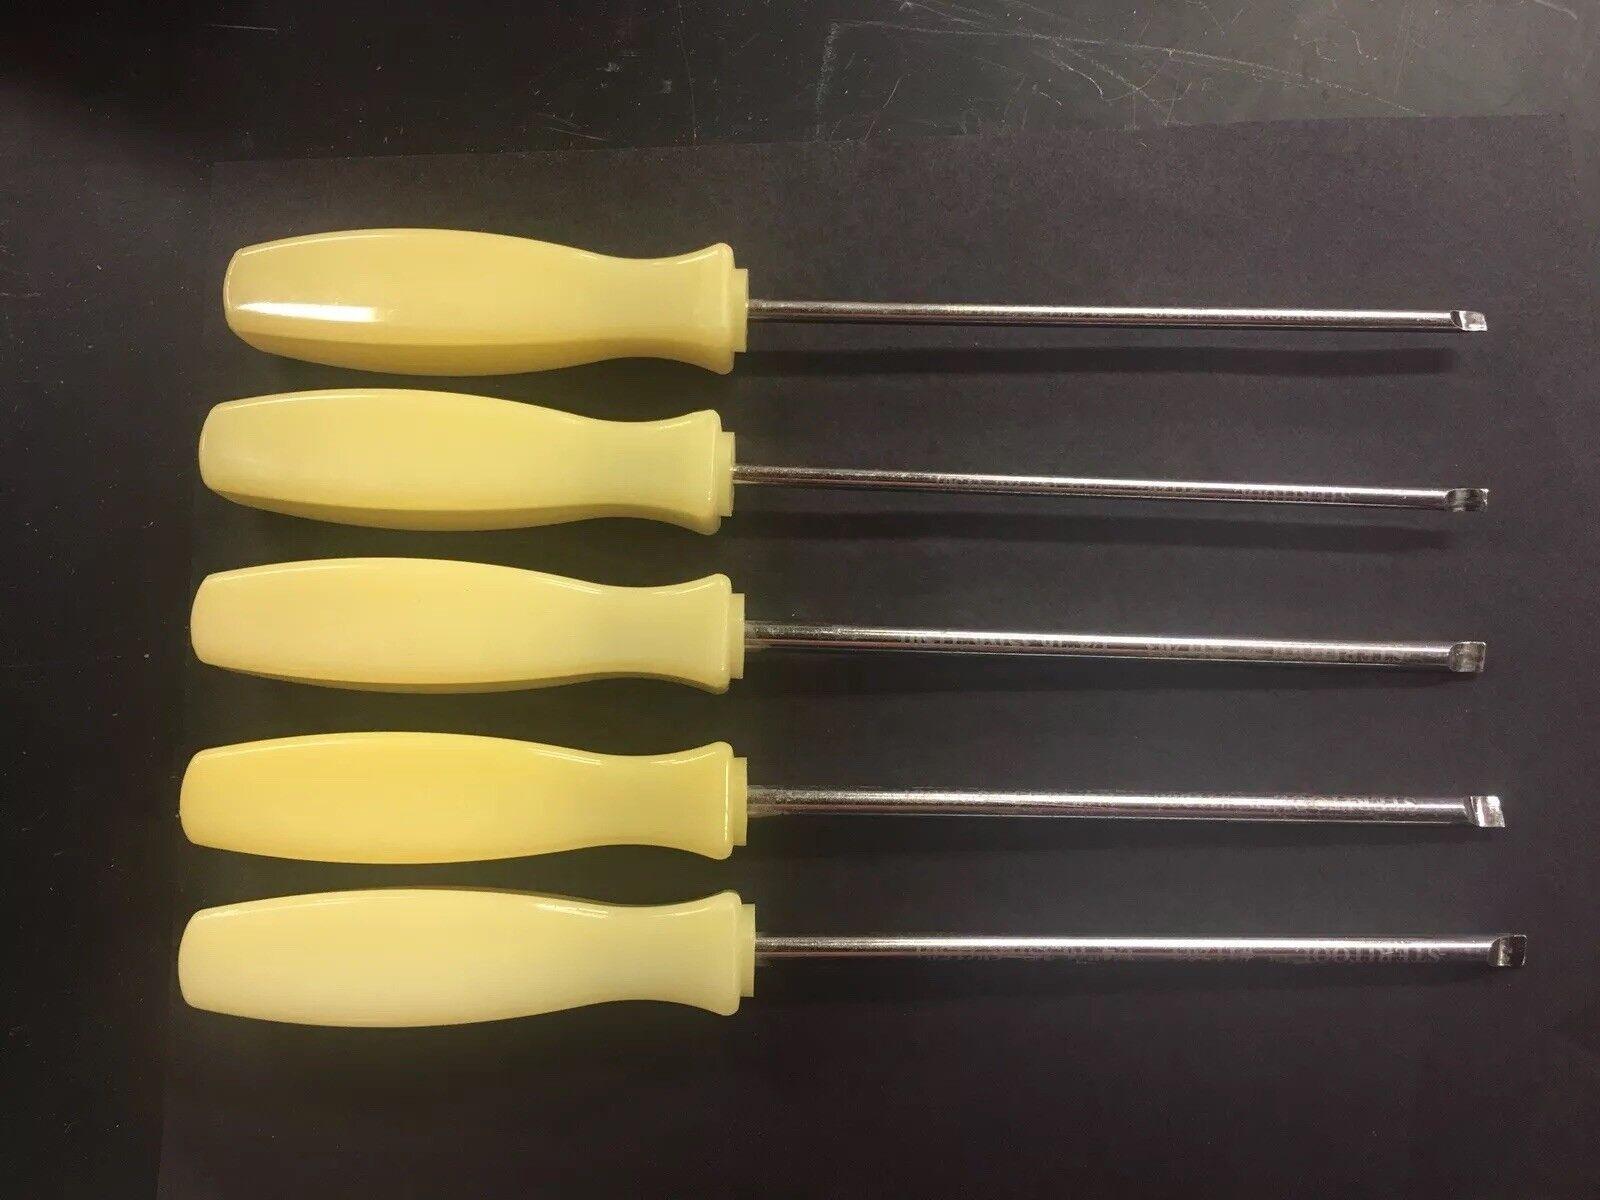 Steritool Stainless Steel Straight Blade Screwdrivers Nylon Handles Used Set of5